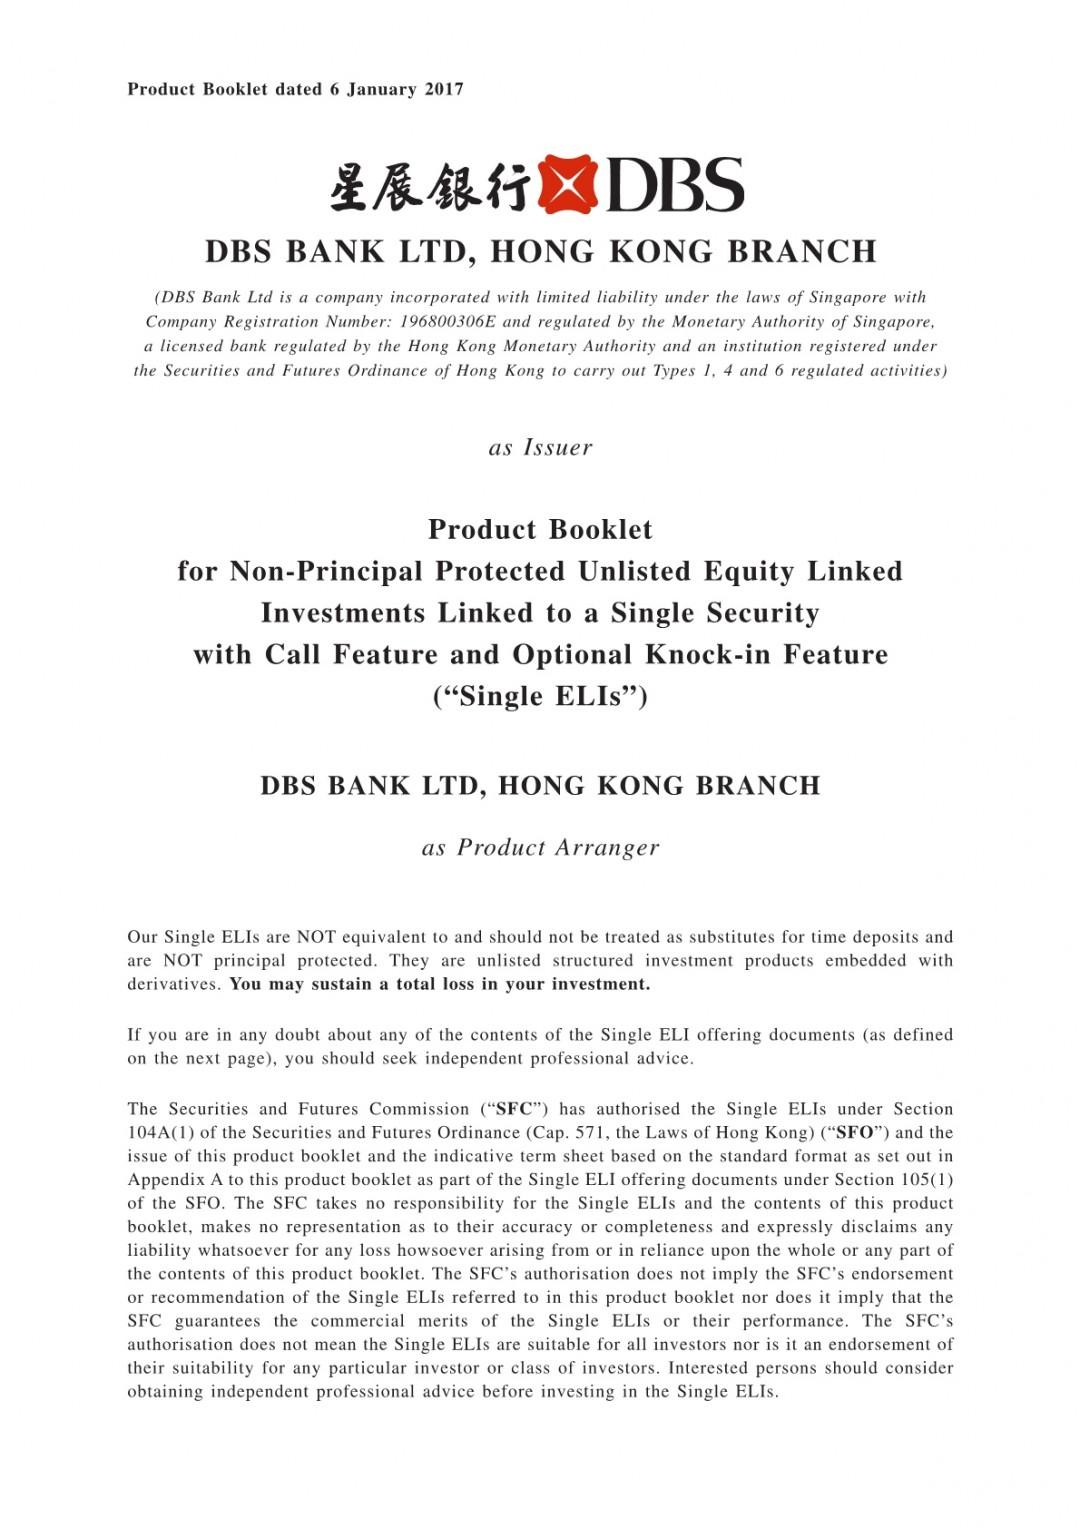 DBS Bank Ltd, Hong Kong Branch – Product Booklet (Single ELIs)